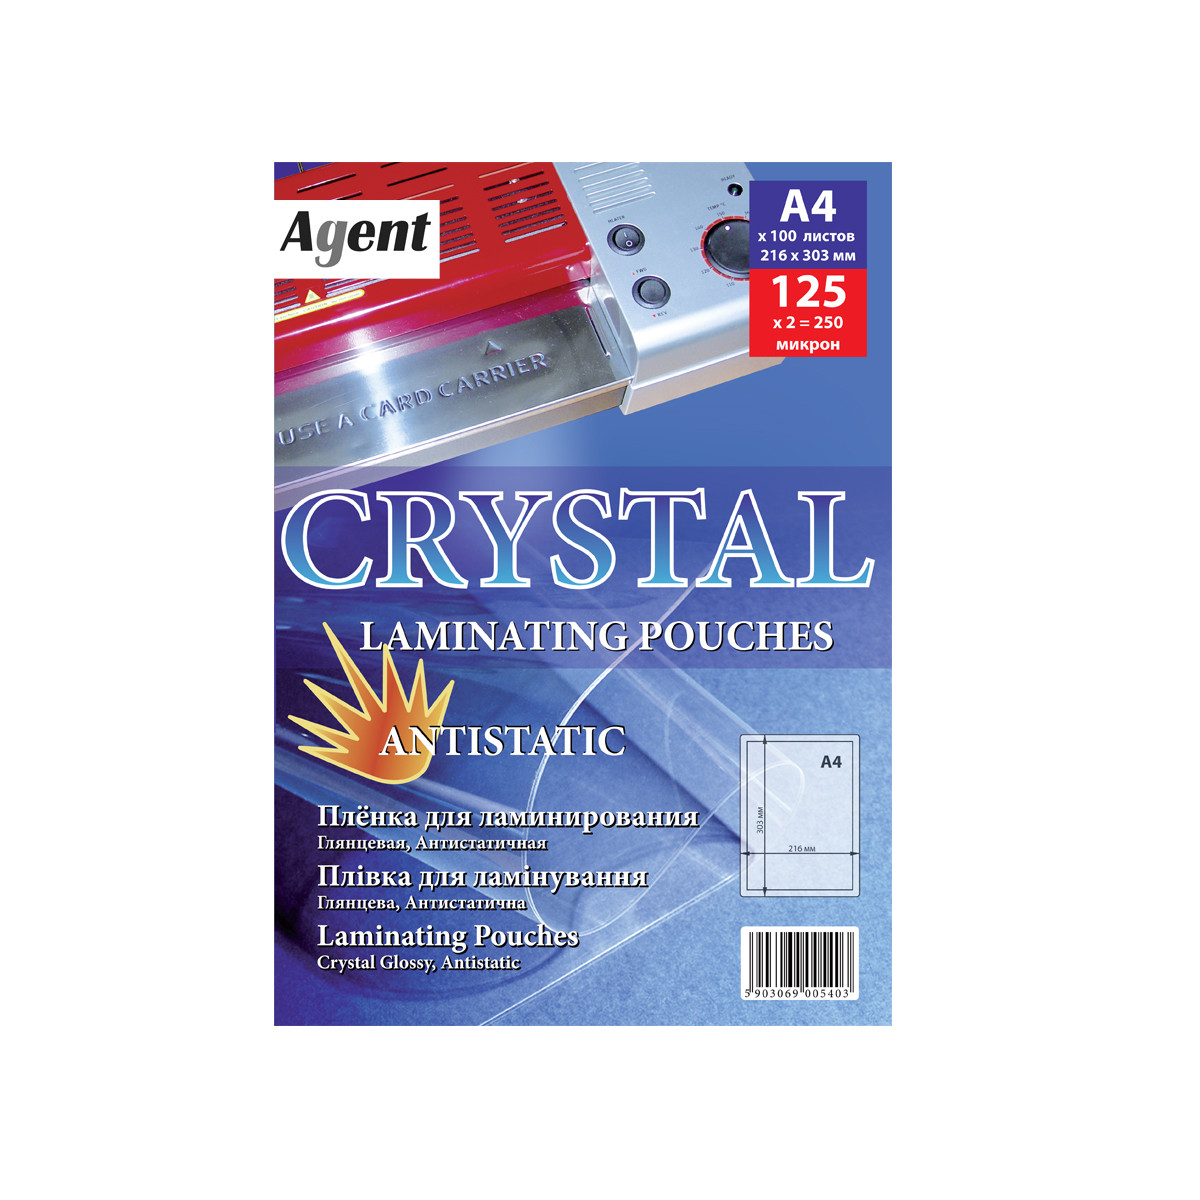 Пленка Agent ANTISTATIC А4 (216х303) 125мк уп/100 (6927972112163)